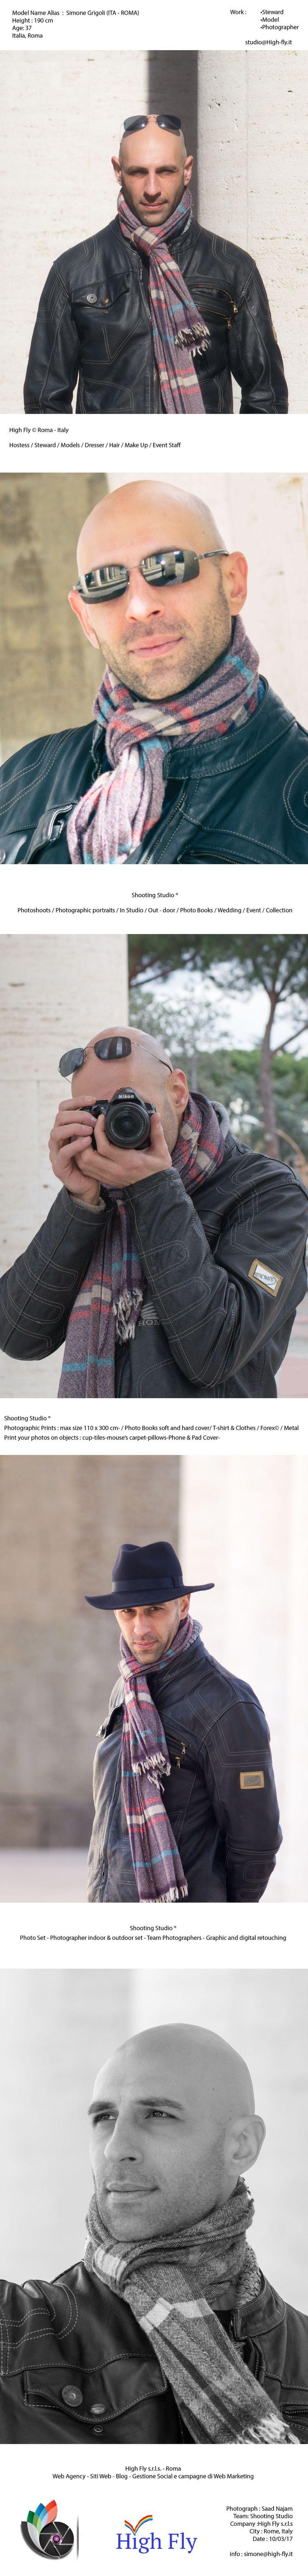 Photographer : Saad Najam        Model : Simone Grigoli              Roma, ita  www.ShootingStudio.it  #HighFly #shootingstudio #shooting #studio #photo #foto #modelle #event #crew #promotion #Hostess #artist #vip #photographer #models #wonderfull #girls #photobook #fotobook #bookfotografico #cosplay #fantasy #wedding #ritratti #portrait  #highfly #setfotografico #fotografo #fotografi #photo #photobook #fotografia #photographer #hostess #model #work #image #foto #bookfografico #set